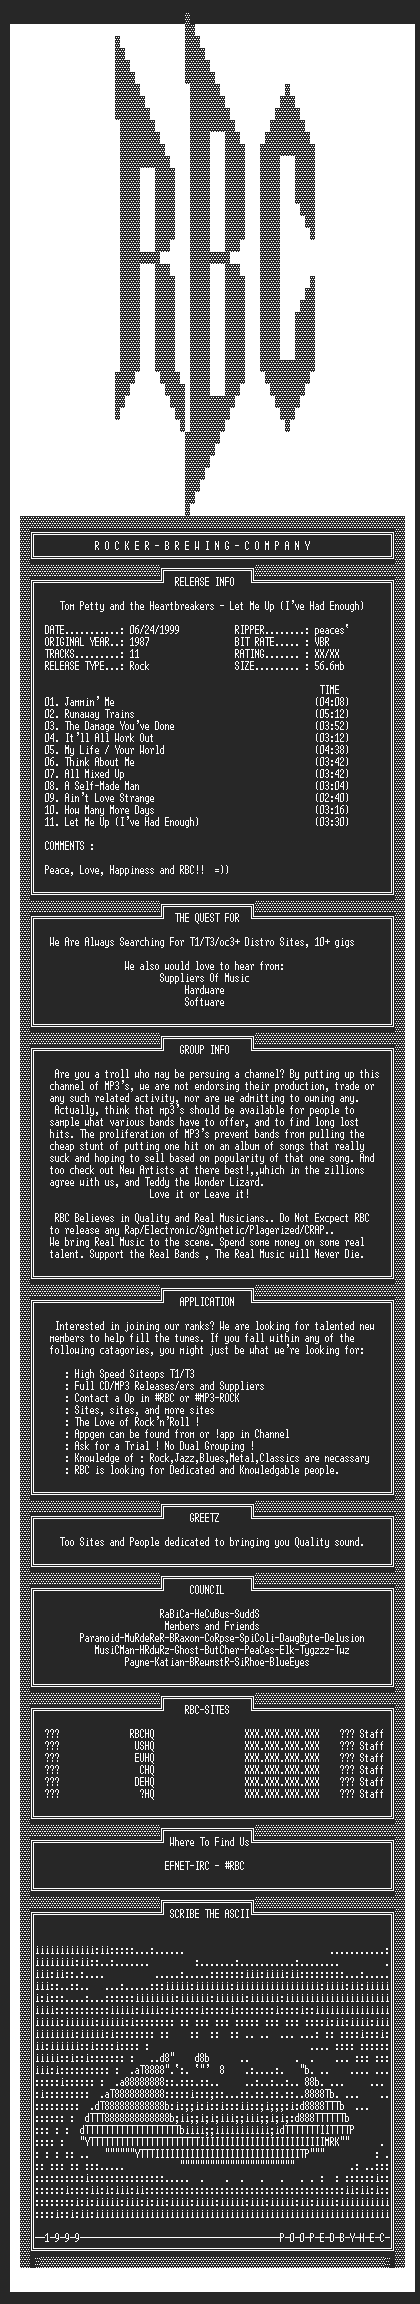 NFO file for Tom_Petty_-_Let_Me_Up_Ive_Had_Enough_(1987)_-_RBC-VBR